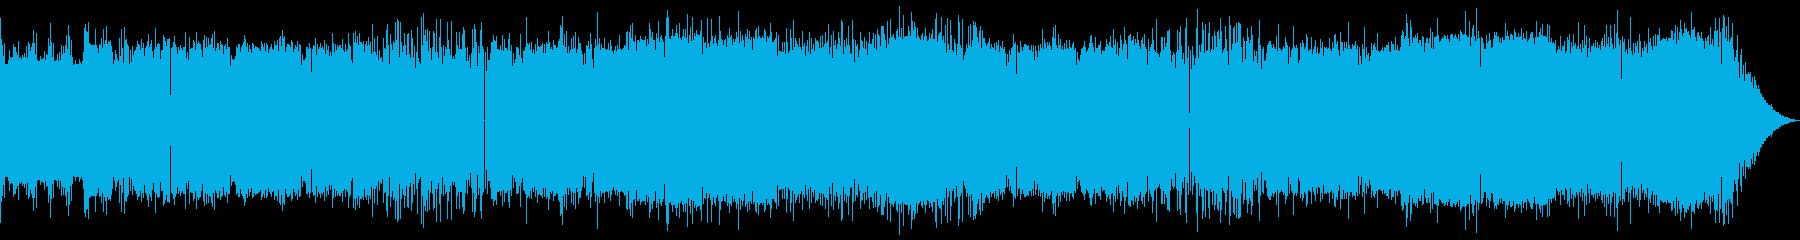 【8bit】哀しみのユフレインボスバトルの再生済みの波形